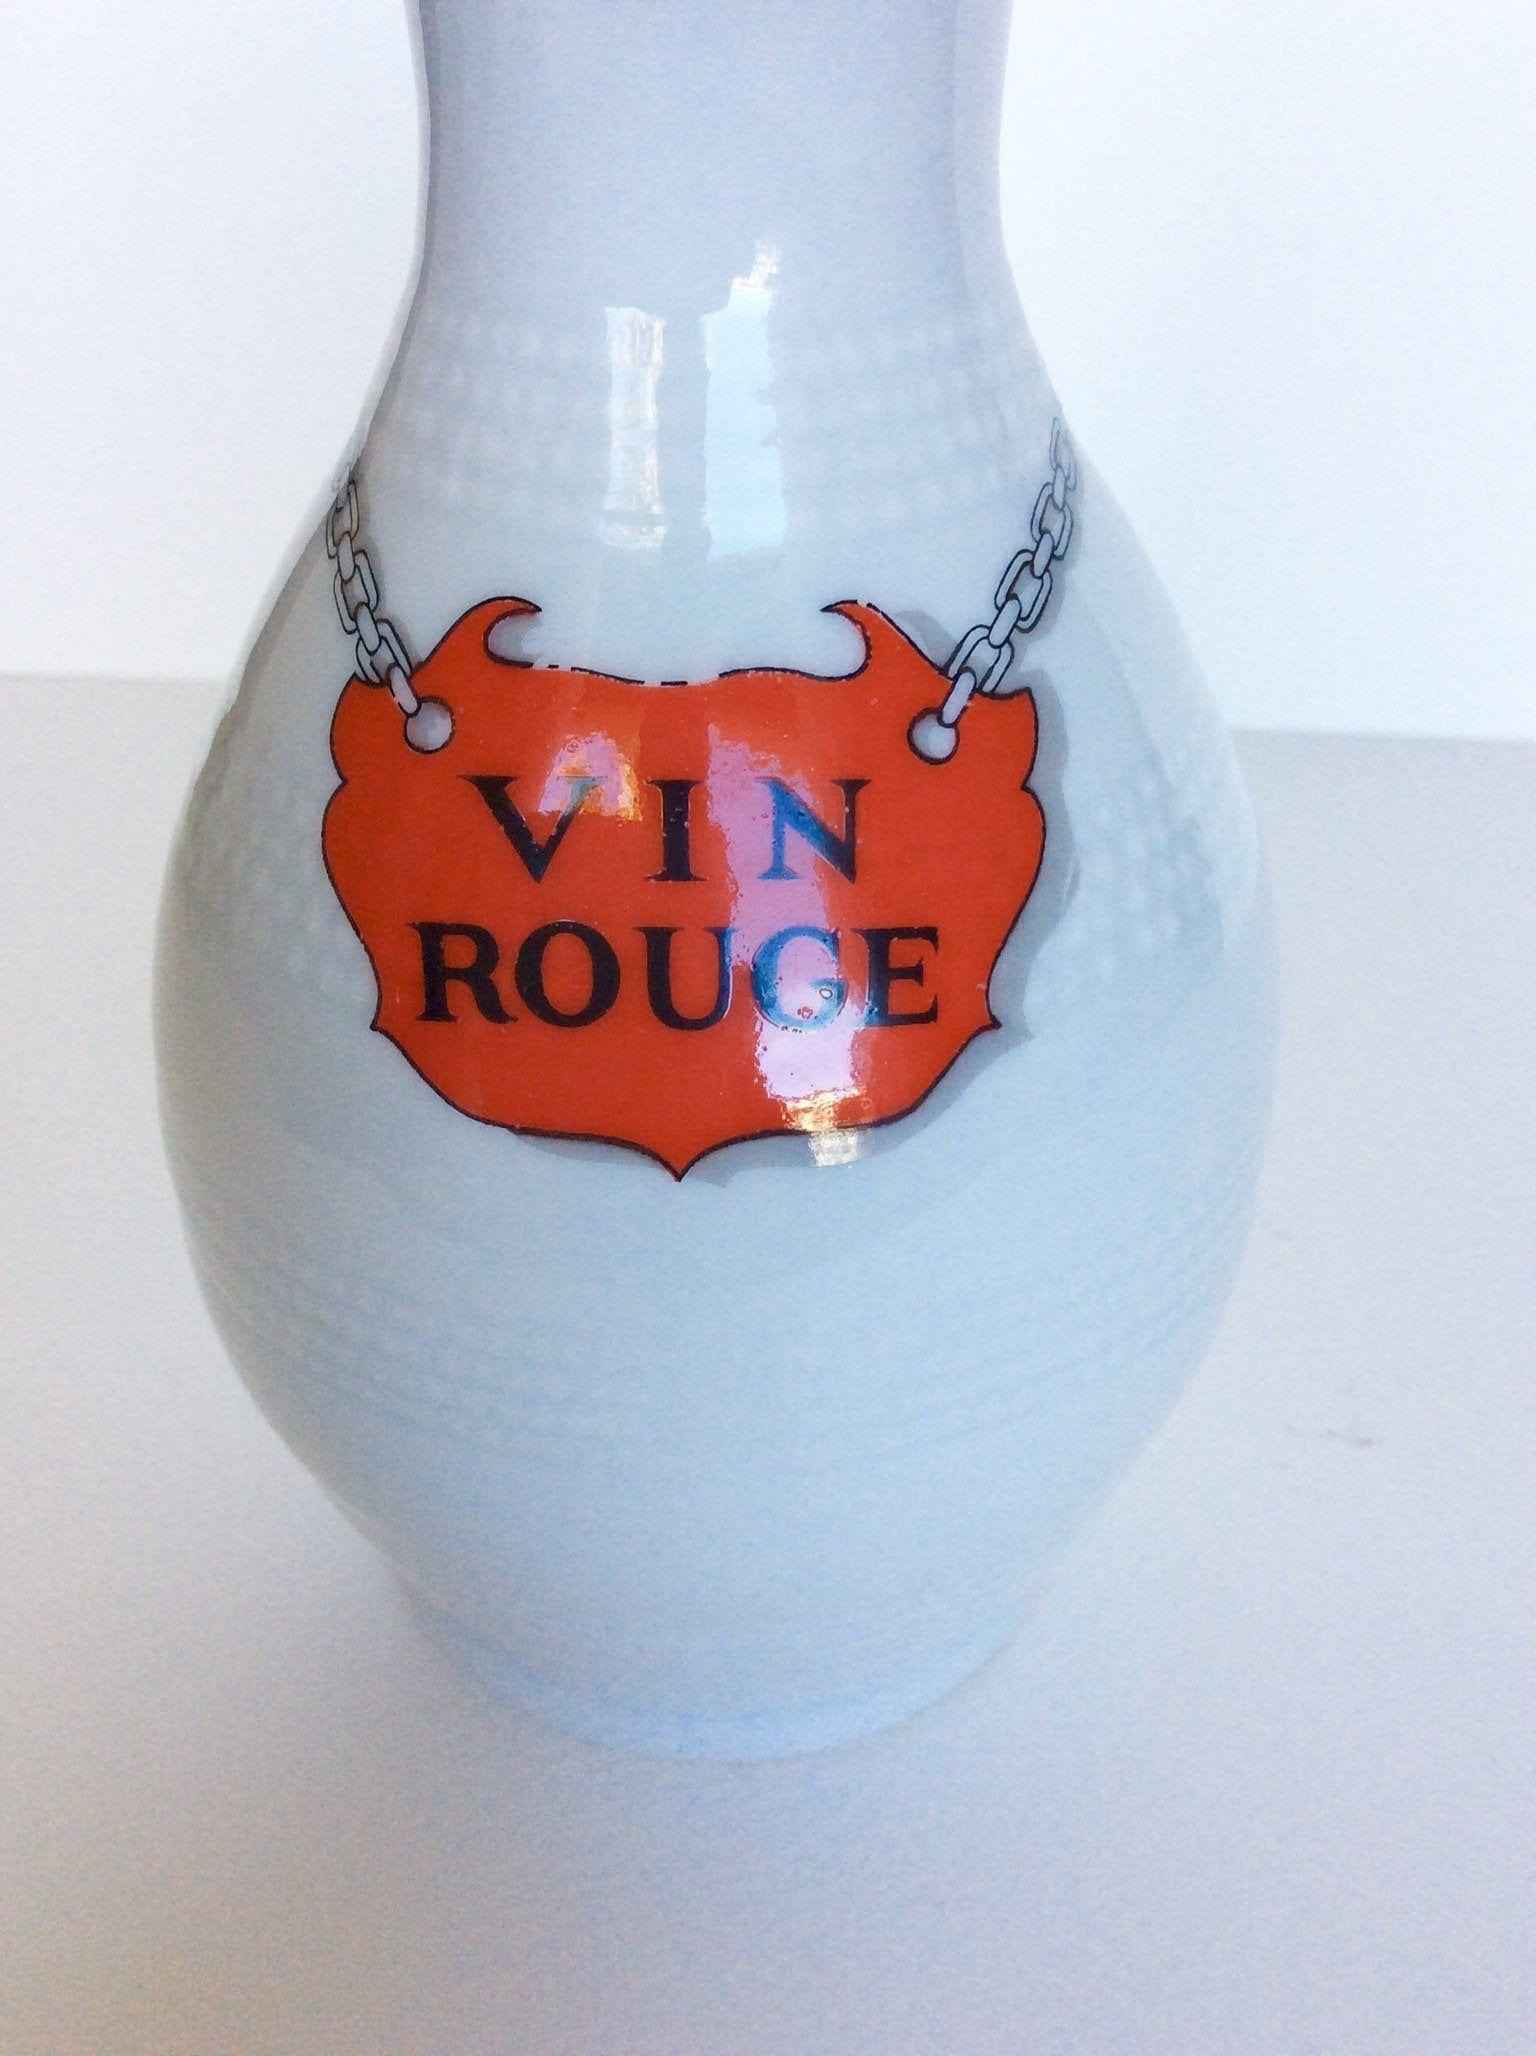 Vin Rouge Carafe Pichet Wine Pitcher Wine Jug Vintage Wine Pitcher French Wine Pitcher Red Wine Pitcher Porcelaine De Paris Wine Vintage Wine French Wine Wine Jug